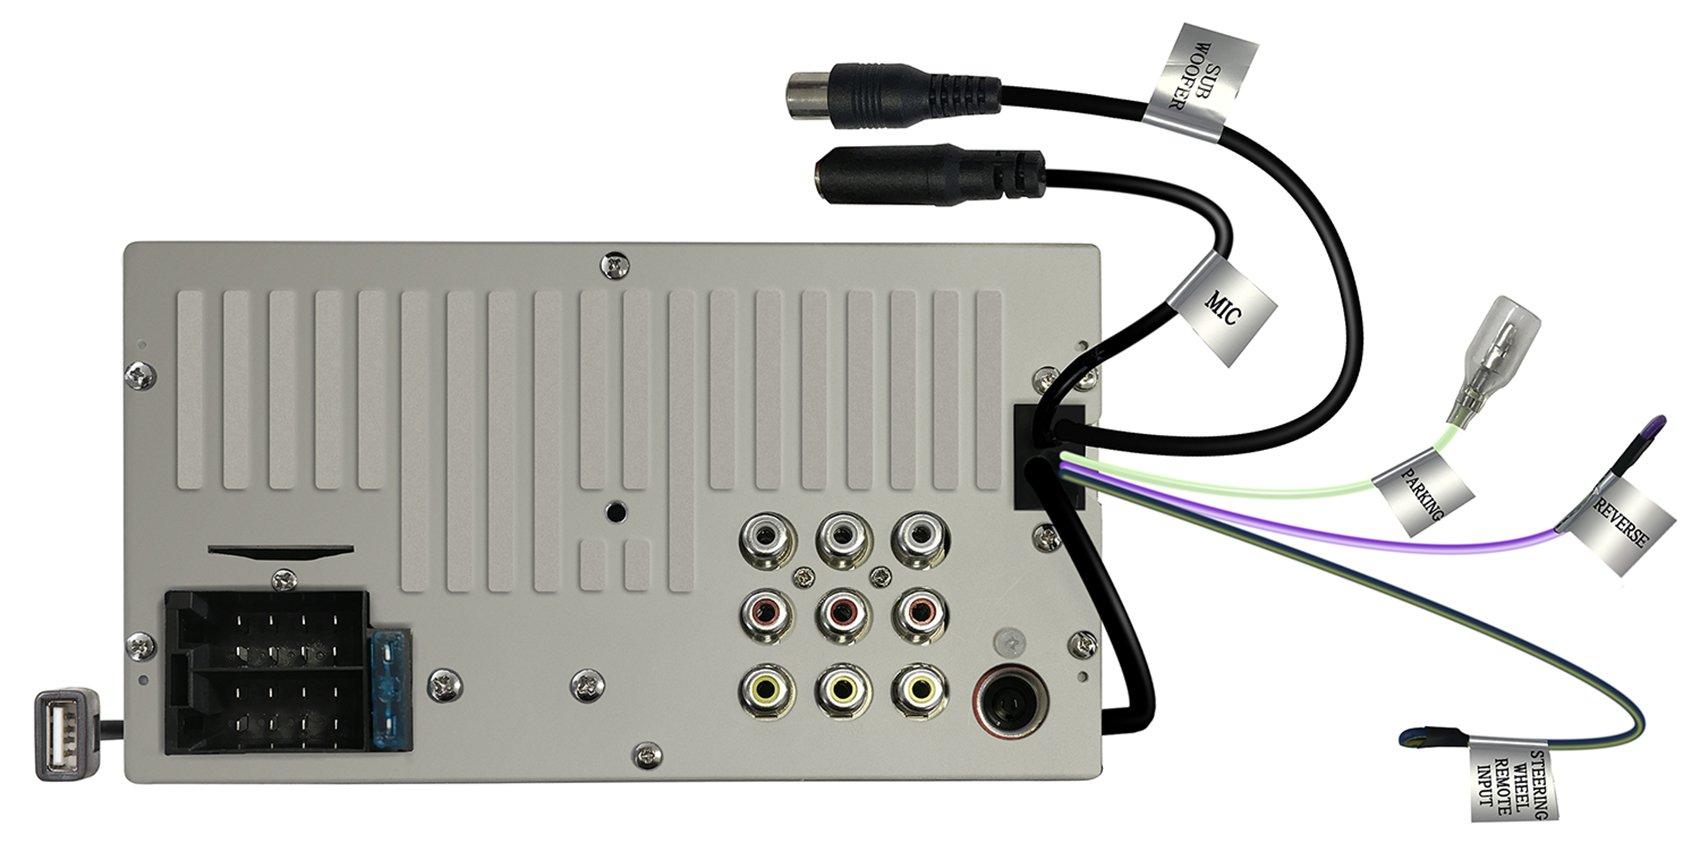 JVC-KW-M24BT-WVGA-Digital-Media-Receiver-mit-Bluetoothmodul-173-cm-schwarz